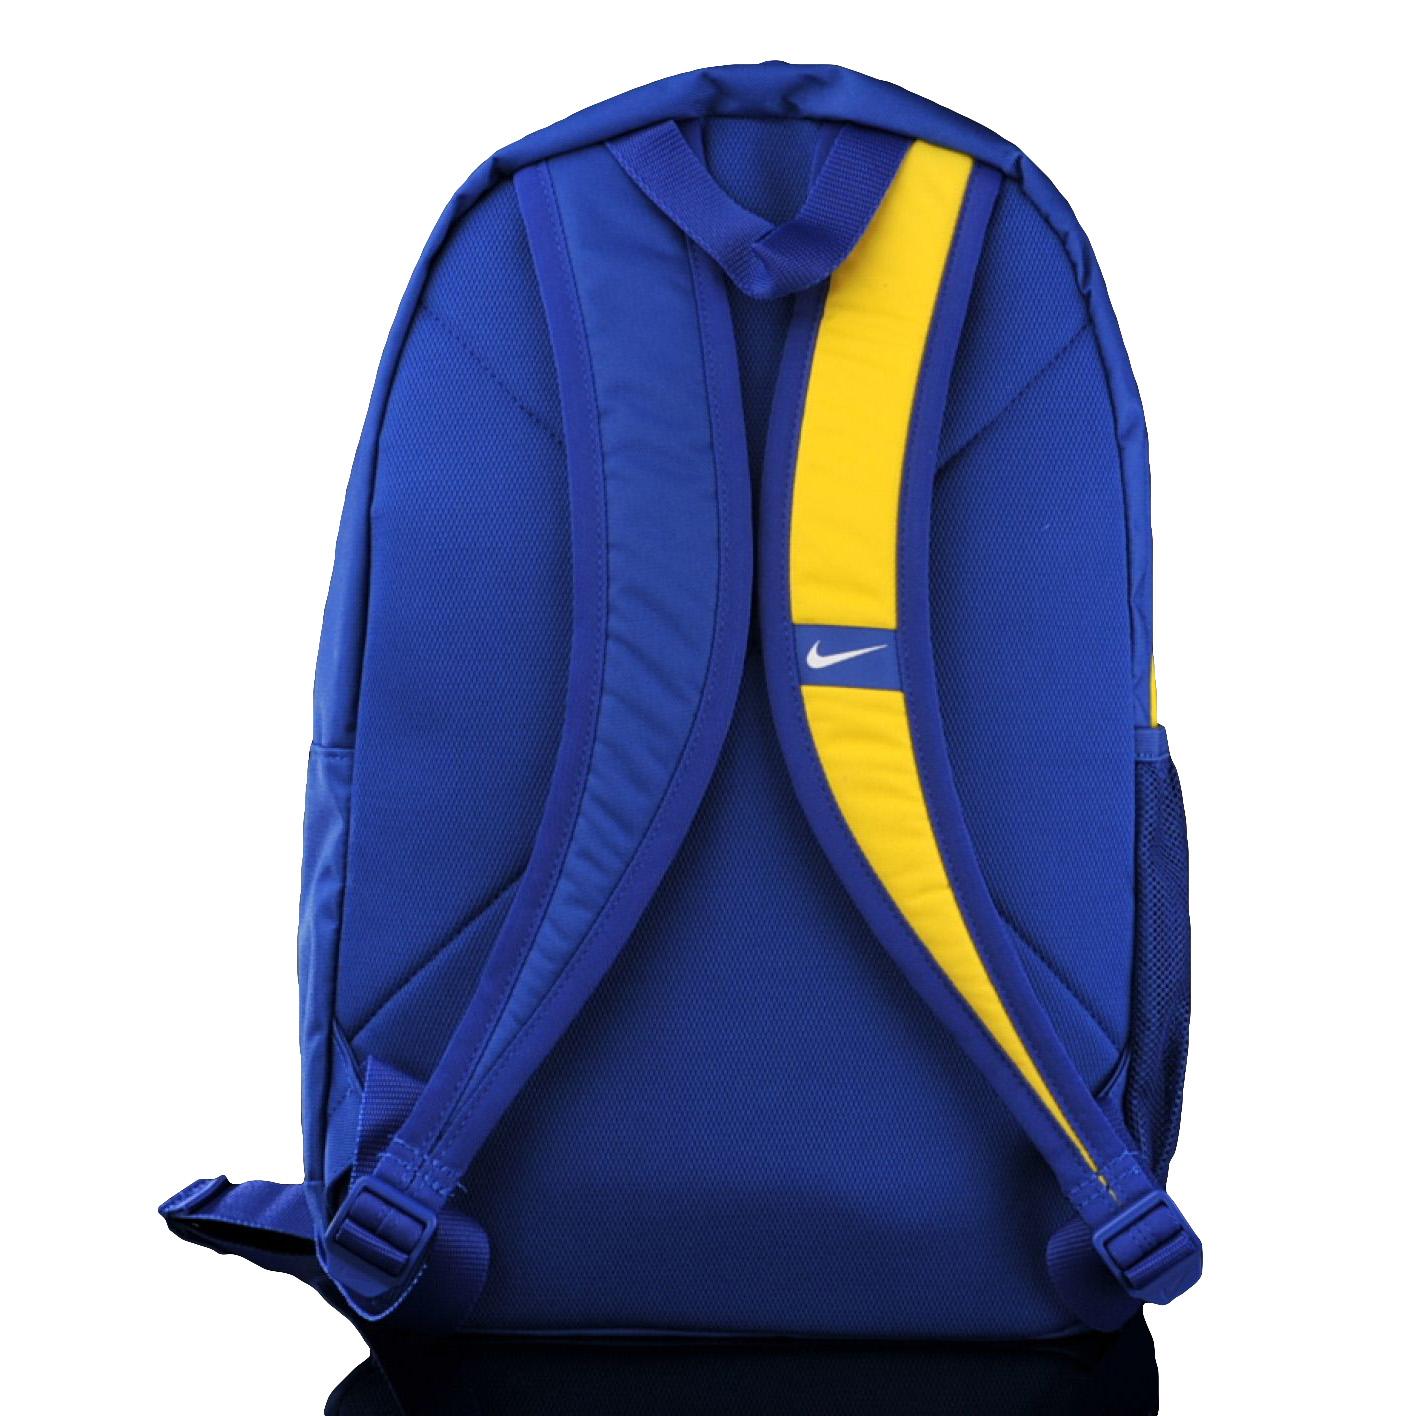 026a63e94791 Nike Stadium FC Chelsea 2018-19 Backpack - Soccer Shop London ...